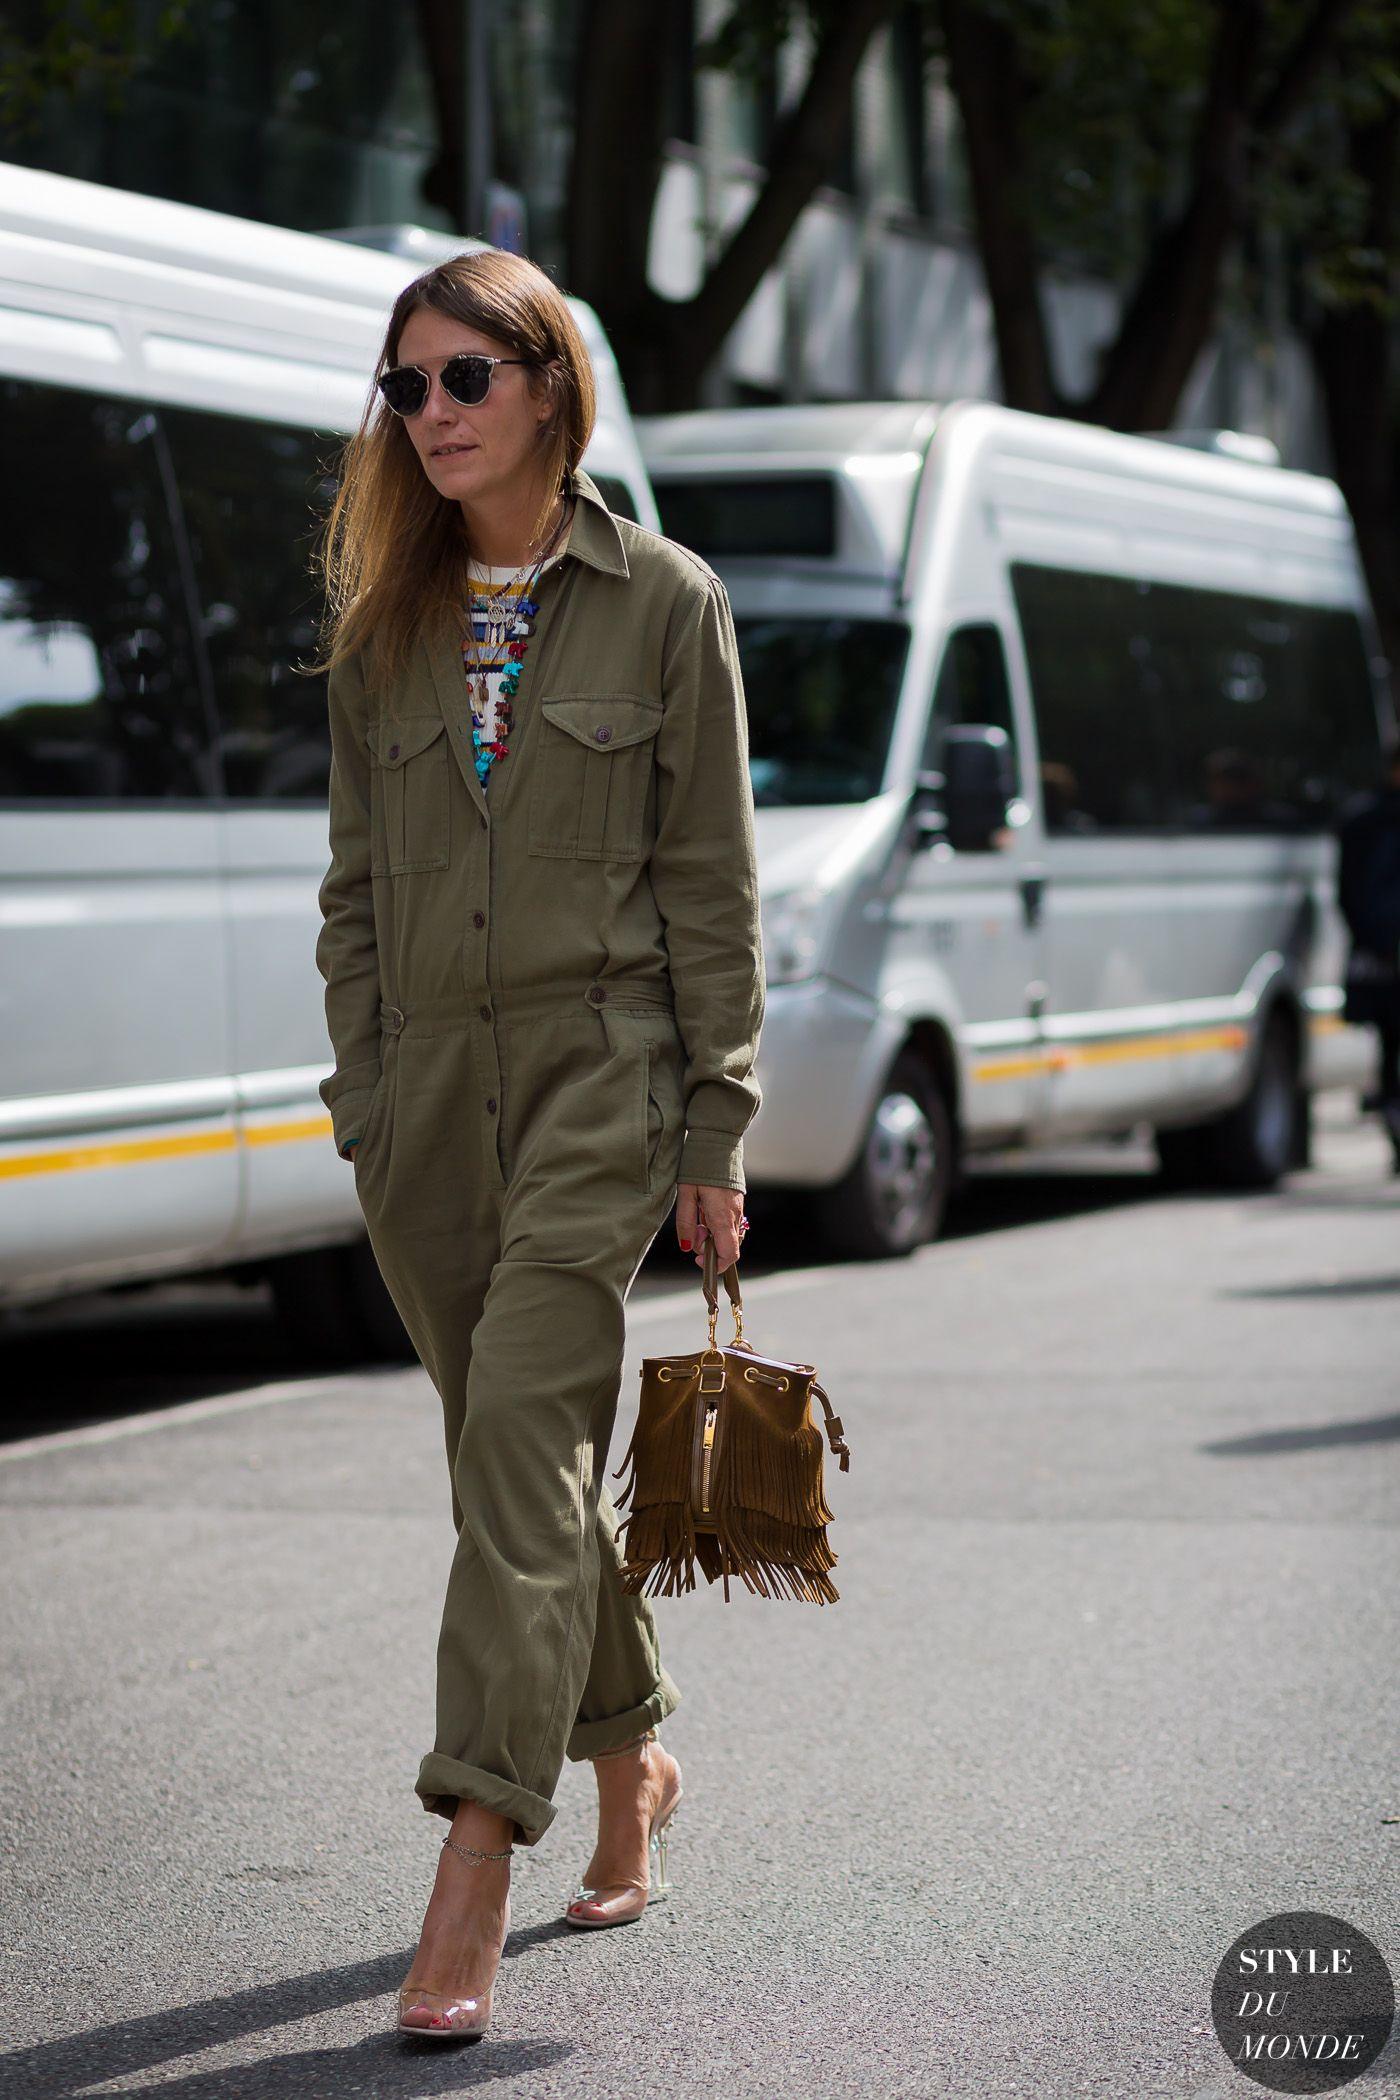 Aurora Sansone Street Style Street Fashion Streetsnaps by STYLEDUMONDE Street Style Fashion Photography